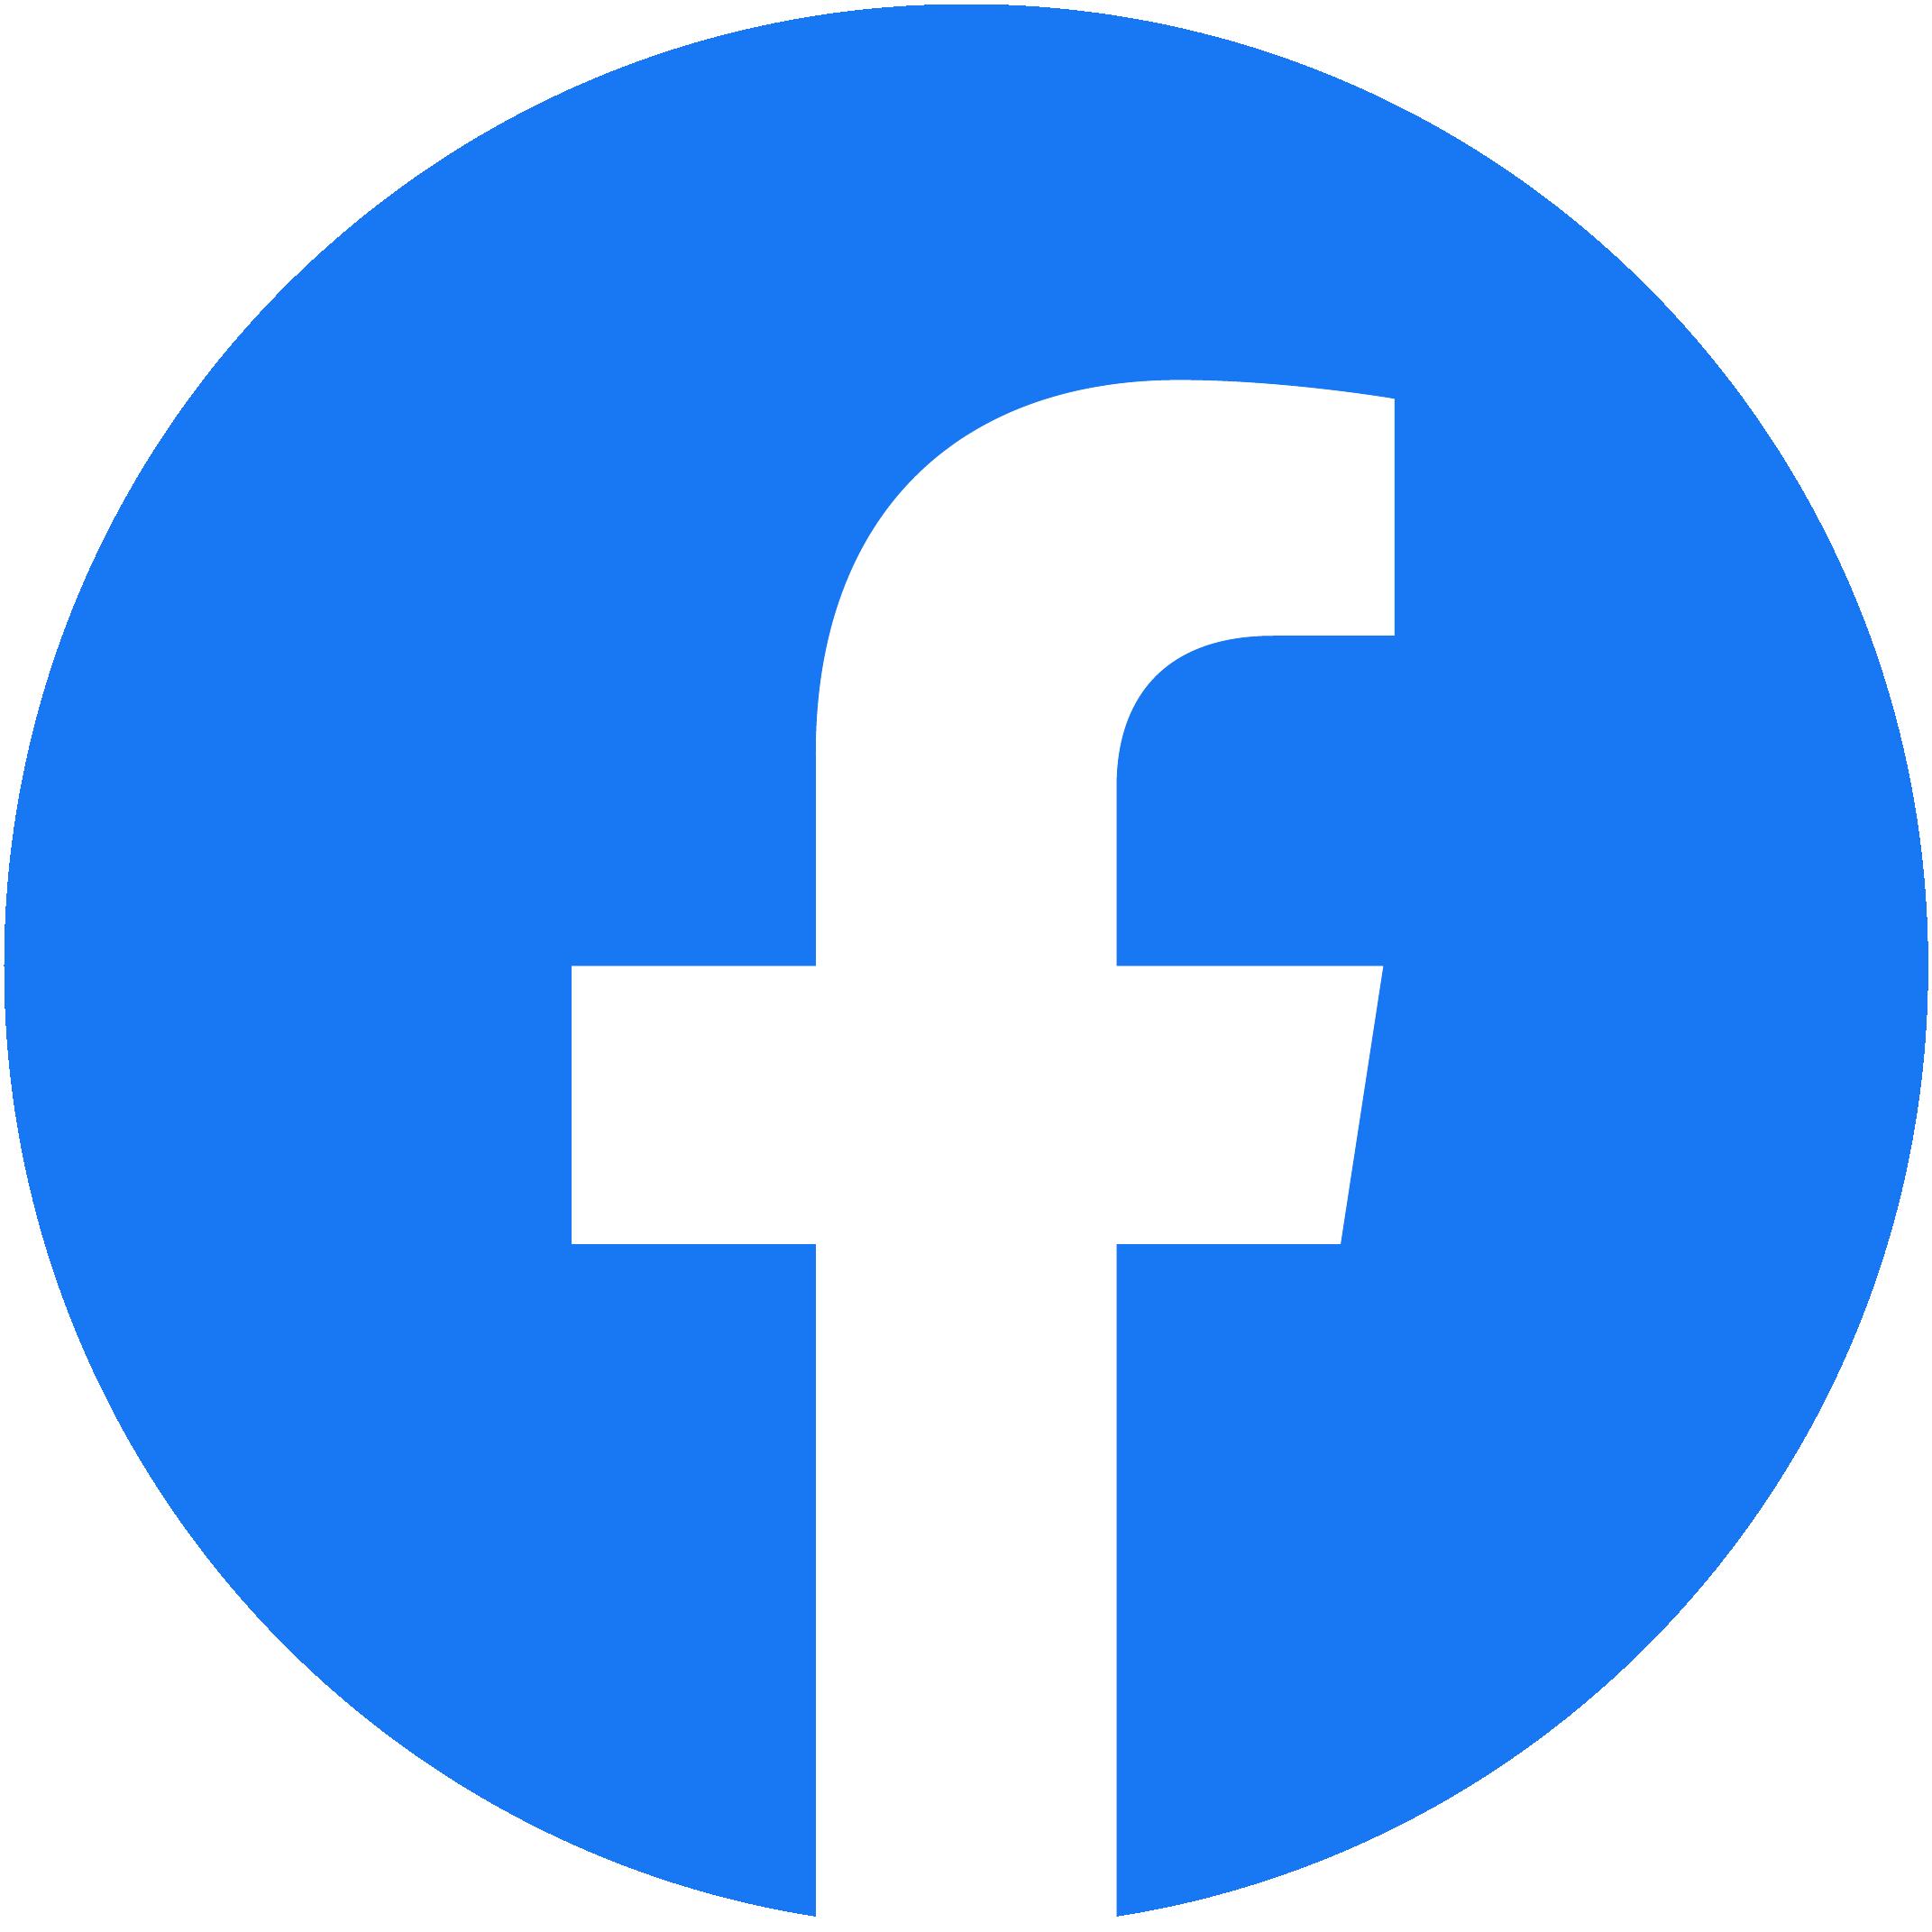 Facebook – Wikipedia